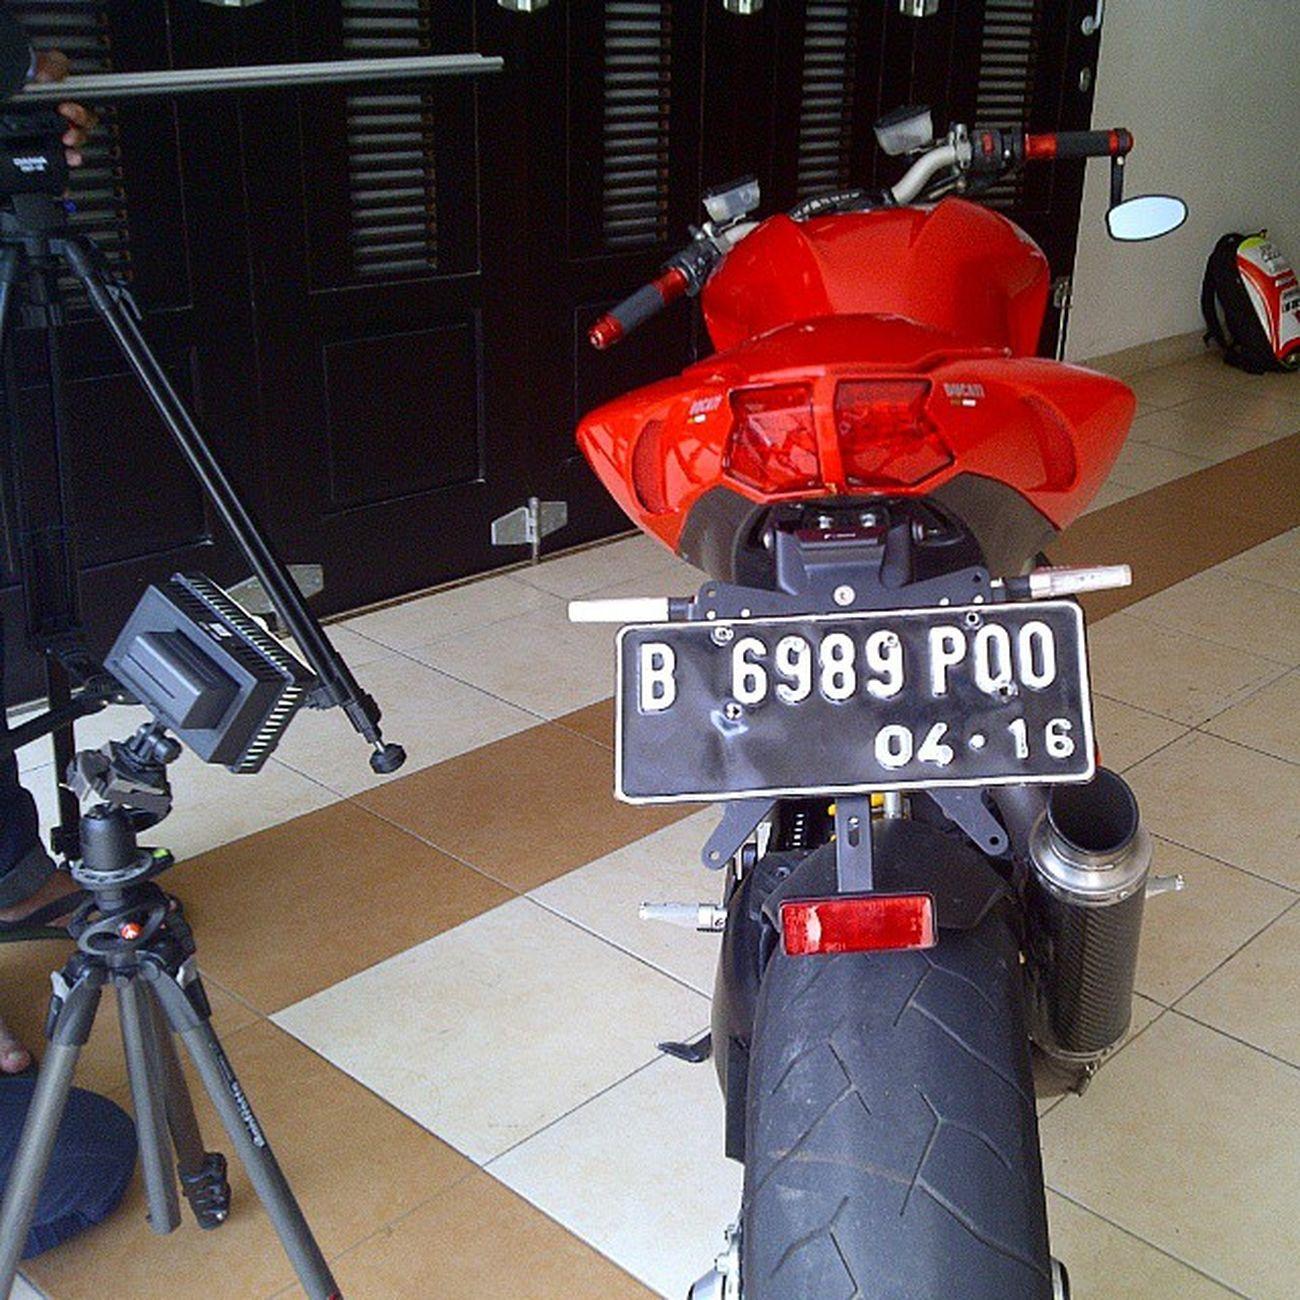 Photo shoot Ducati Streetfighter Ducatistreetfighter S 1098 Ducatista Ducatisti Brembo  Ohlins Pirelli Termignoni Italia @ducatisofinstagram